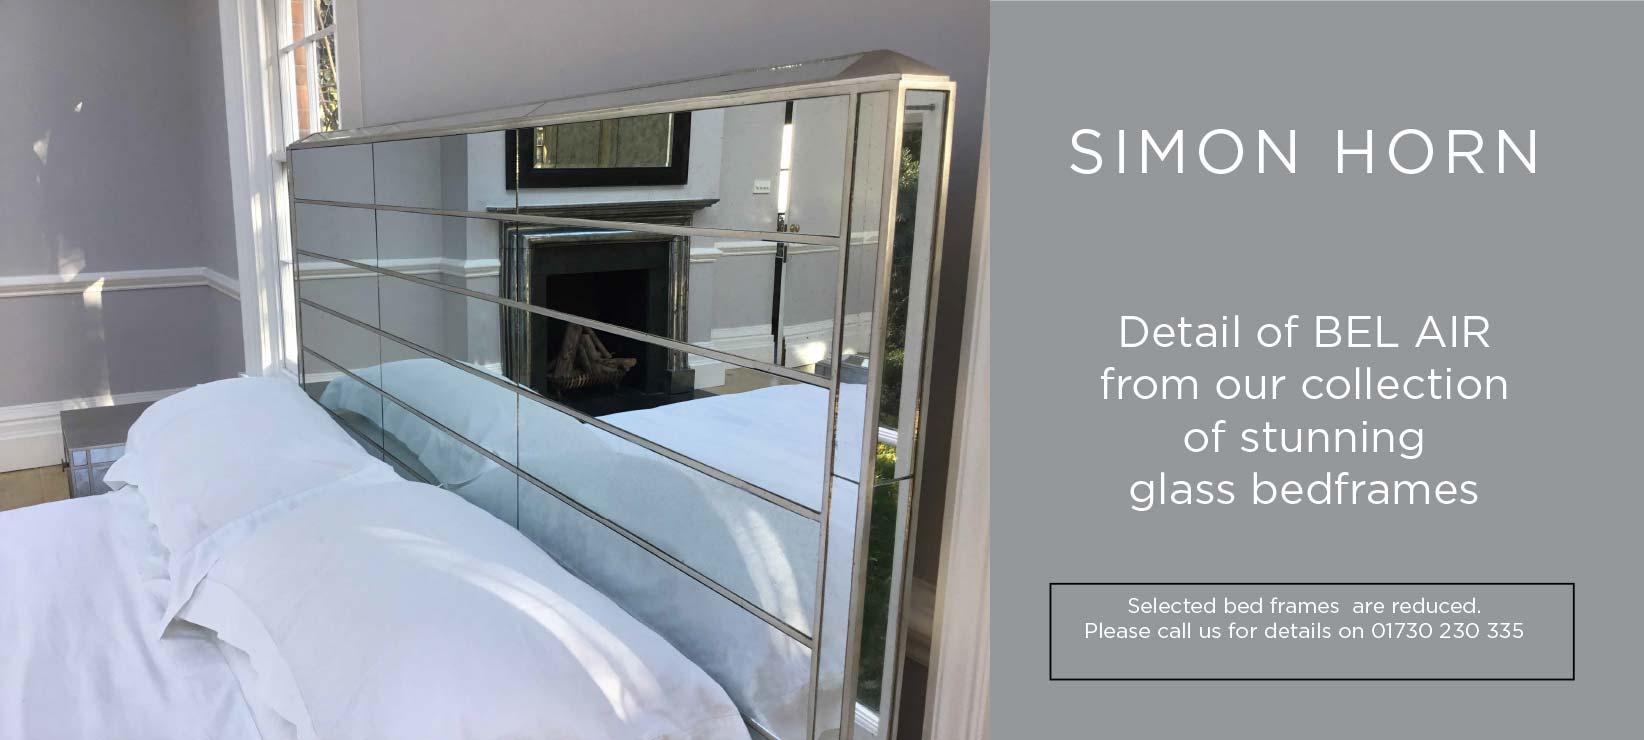 Stunning Bel Air Glass Bedframe From Simon Horn